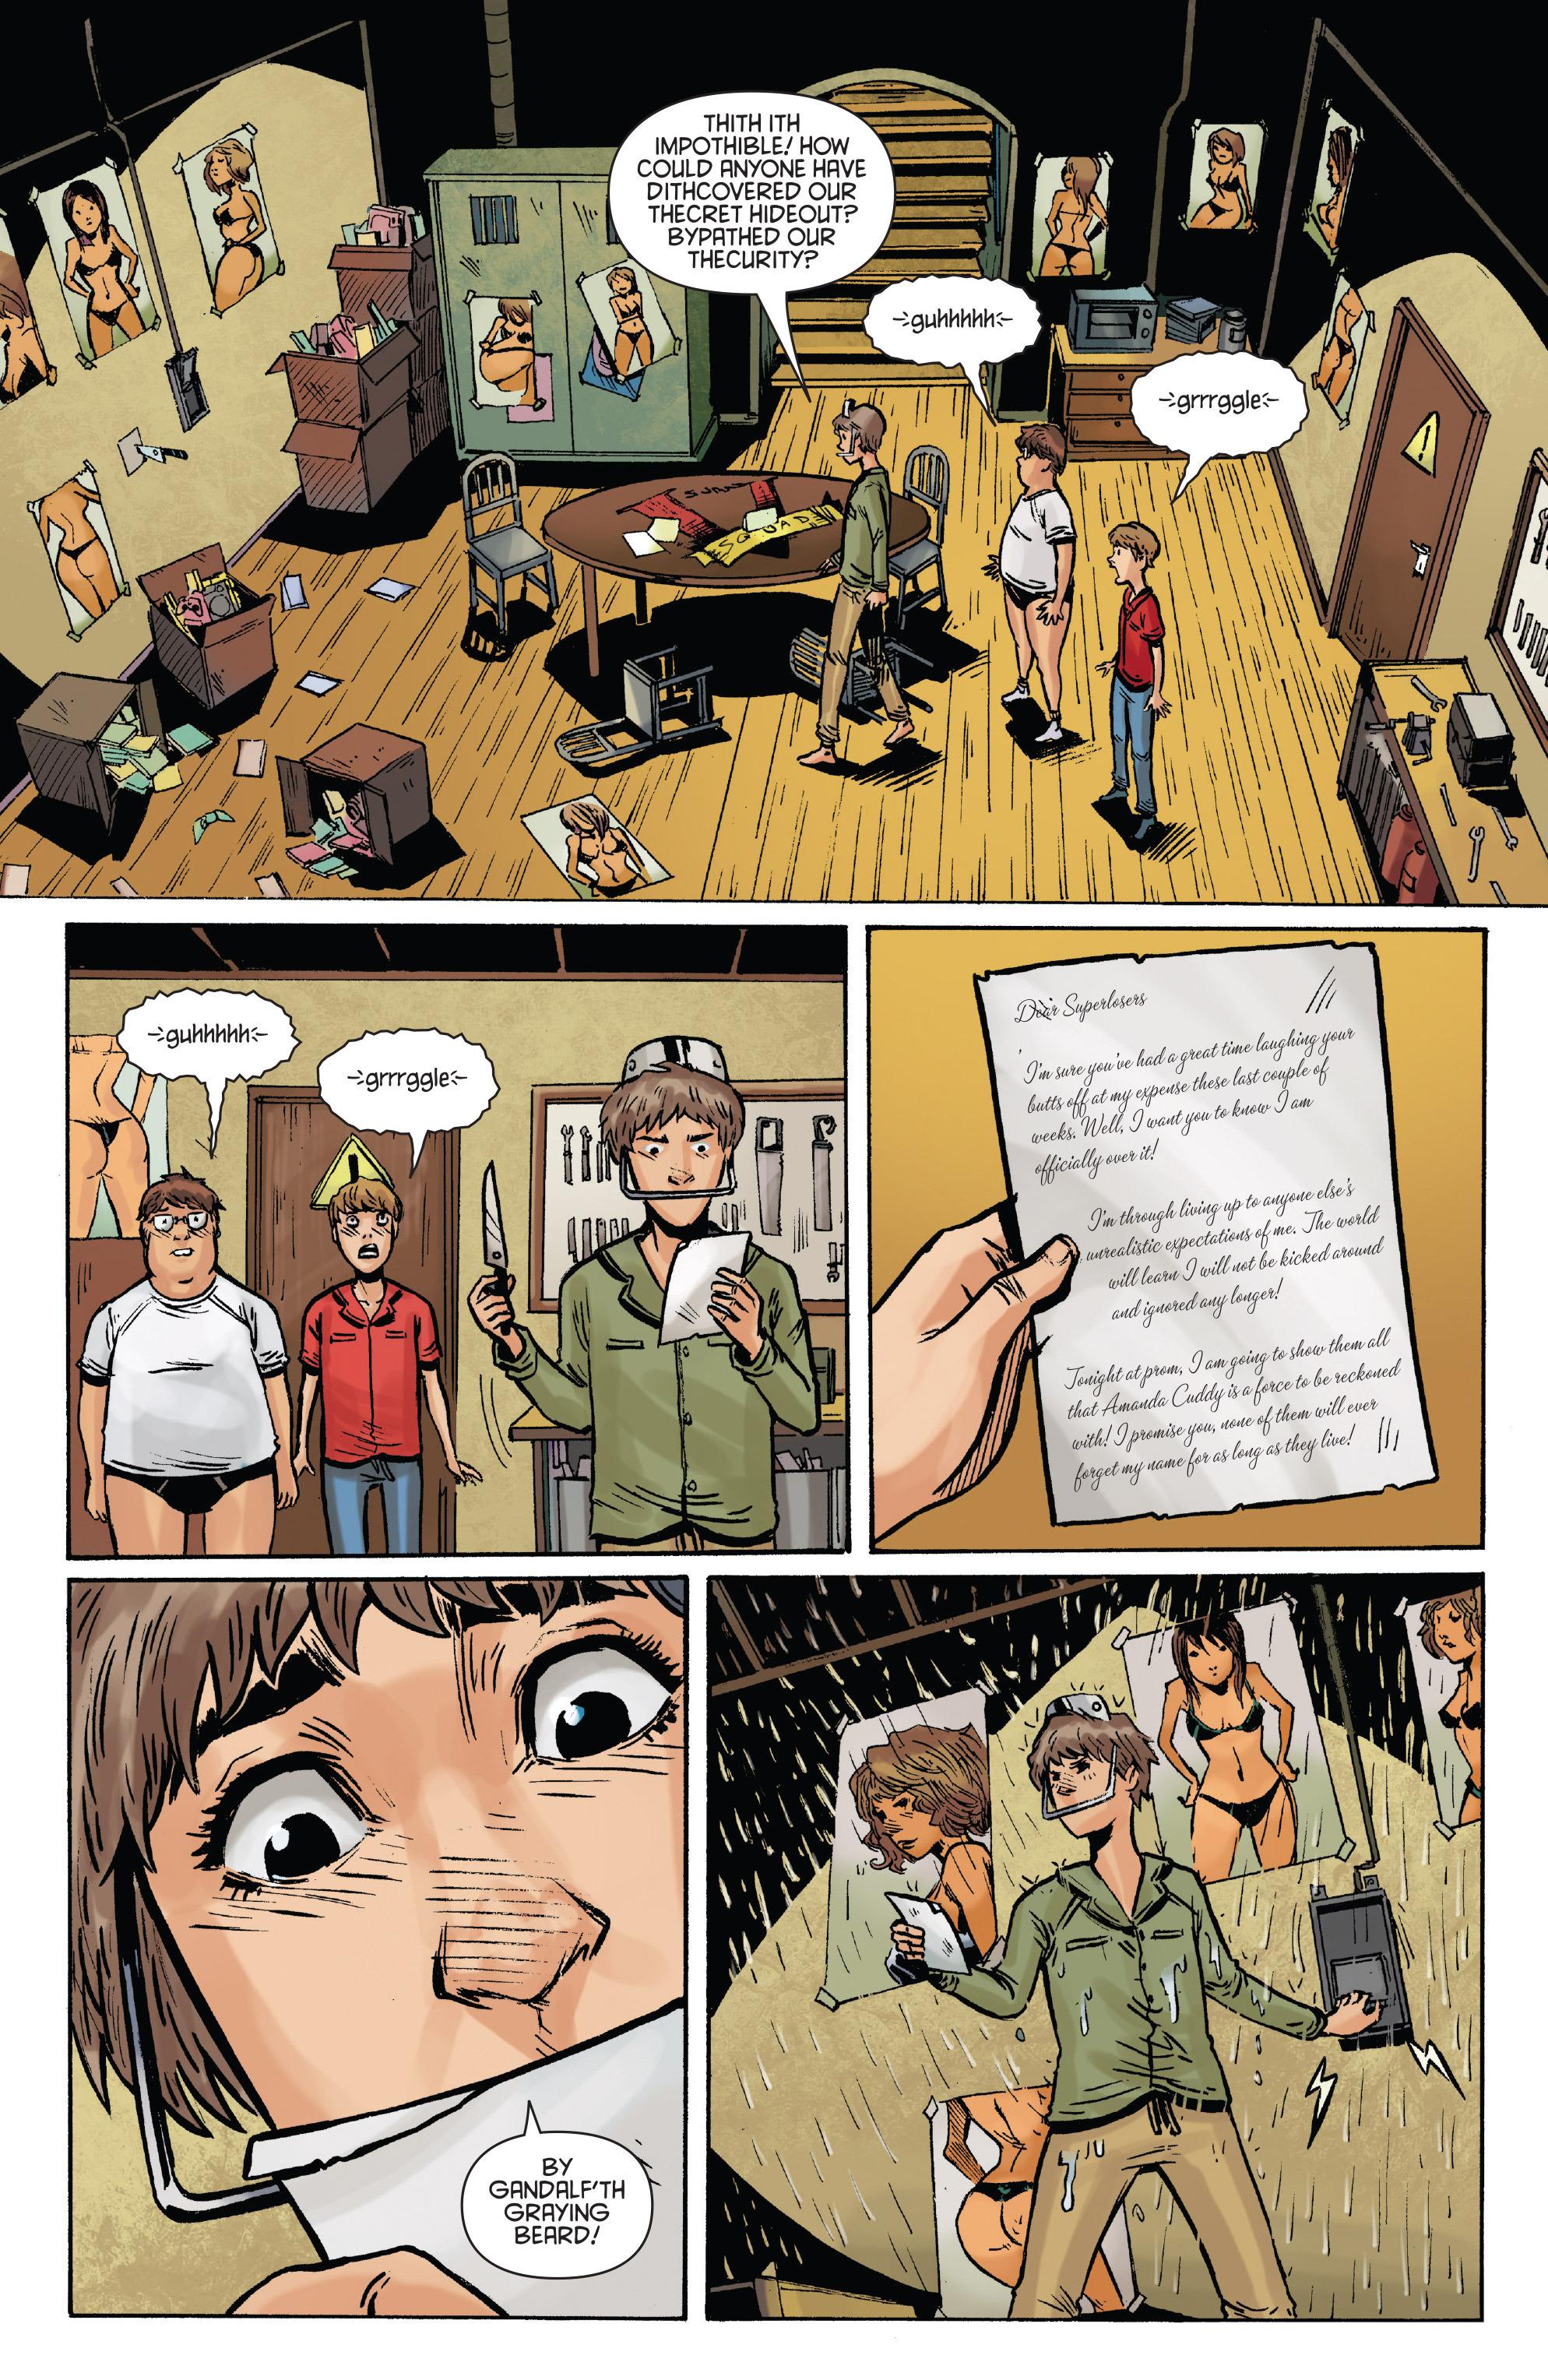 Read online Smosh comic -  Issue #2 - 15